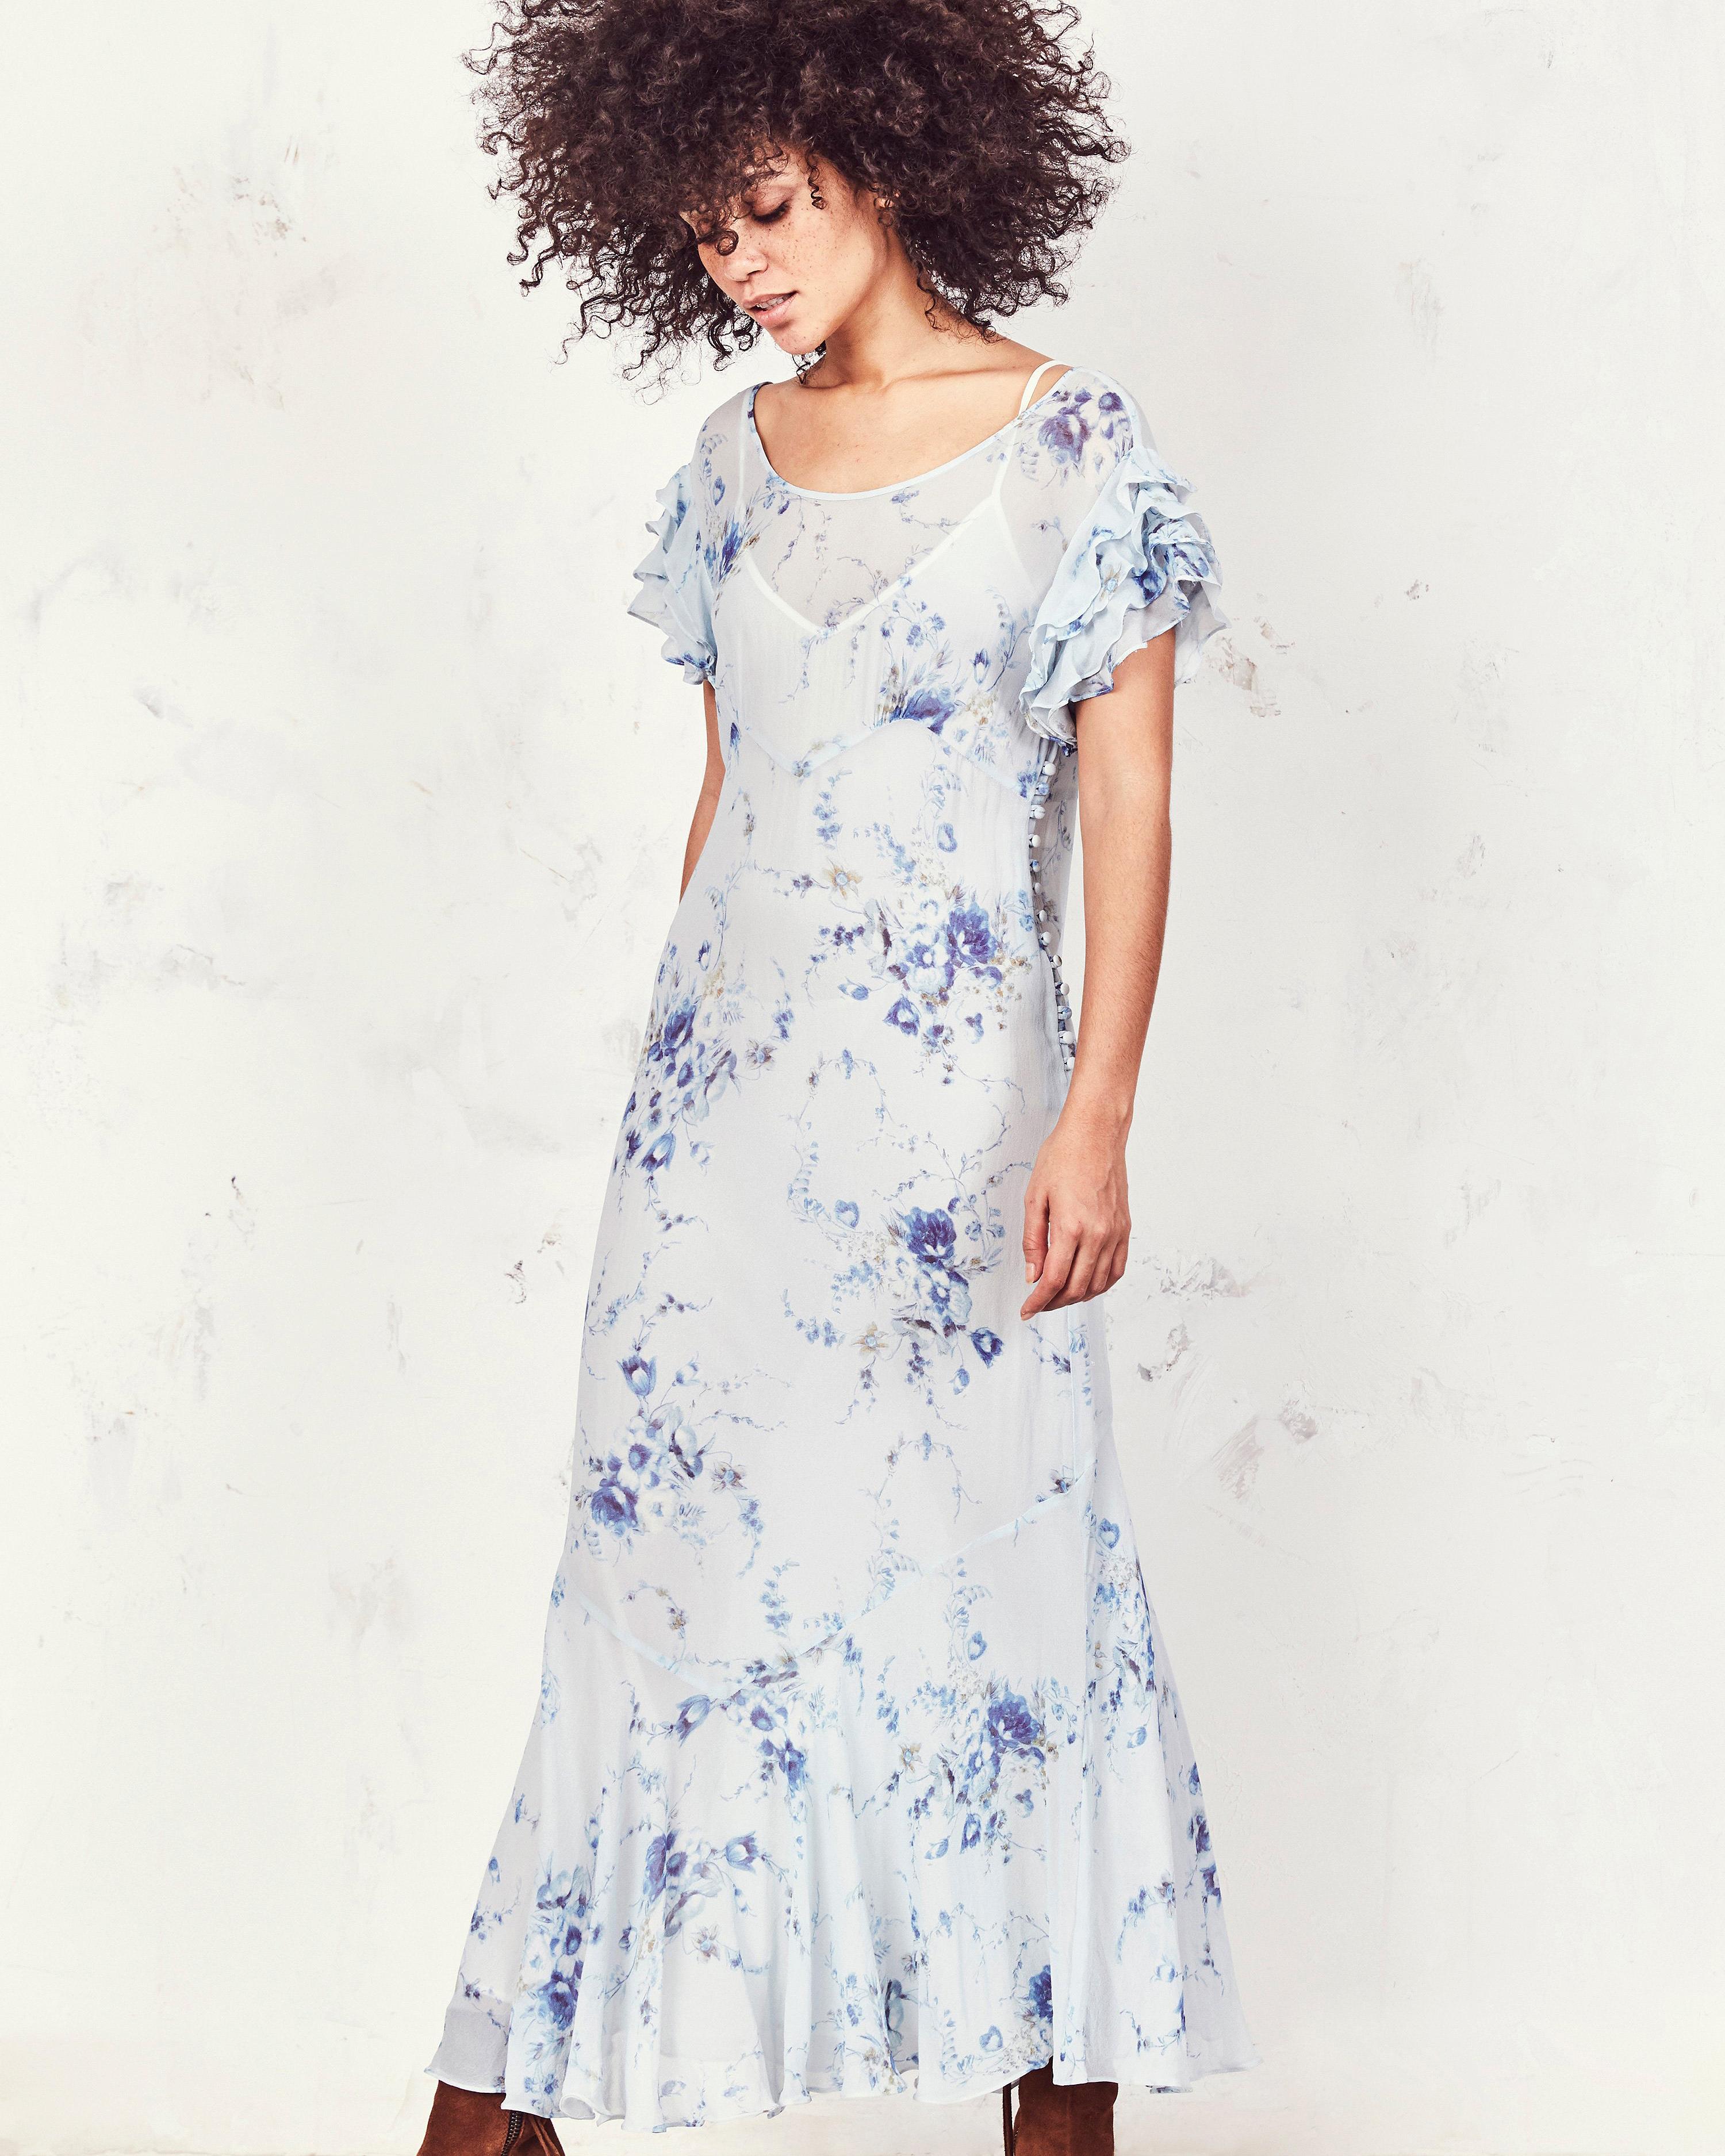 blue floral printed mob dress